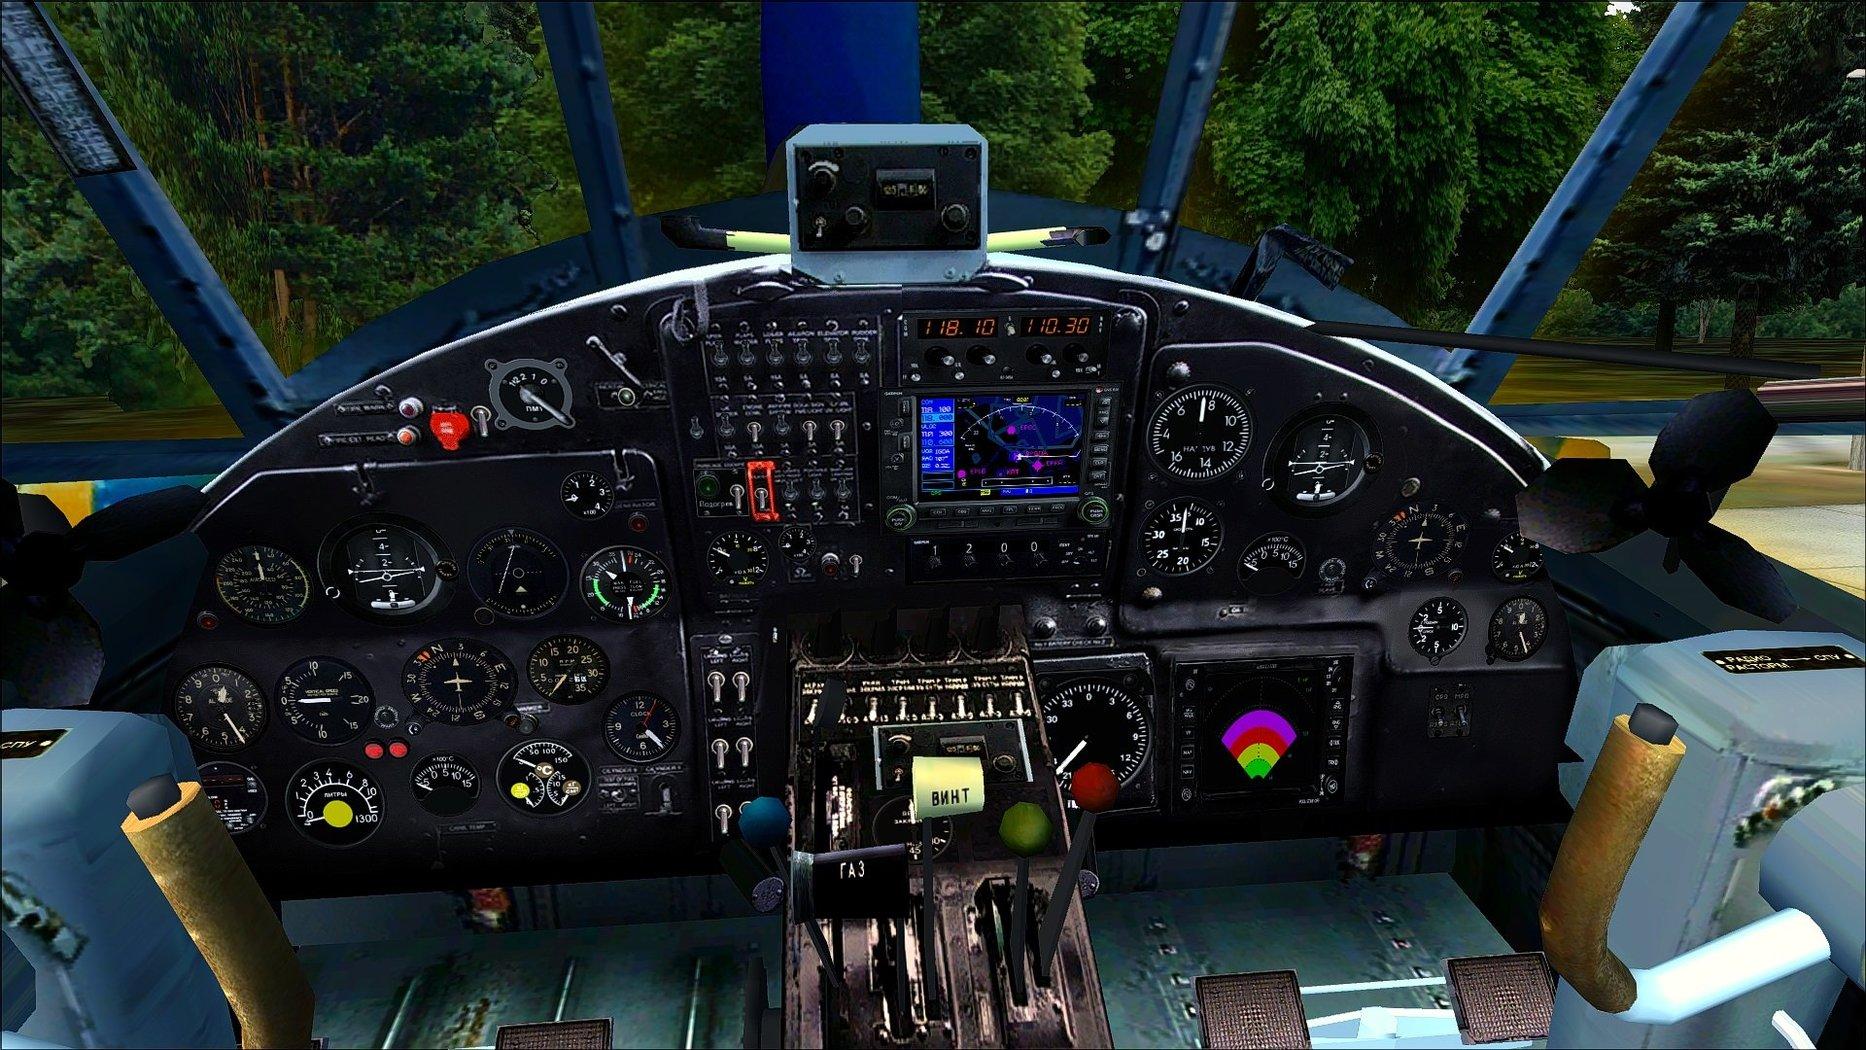 An-2.thumb.jpg.15f57944f9d07277168c756b5be157a7.jpg